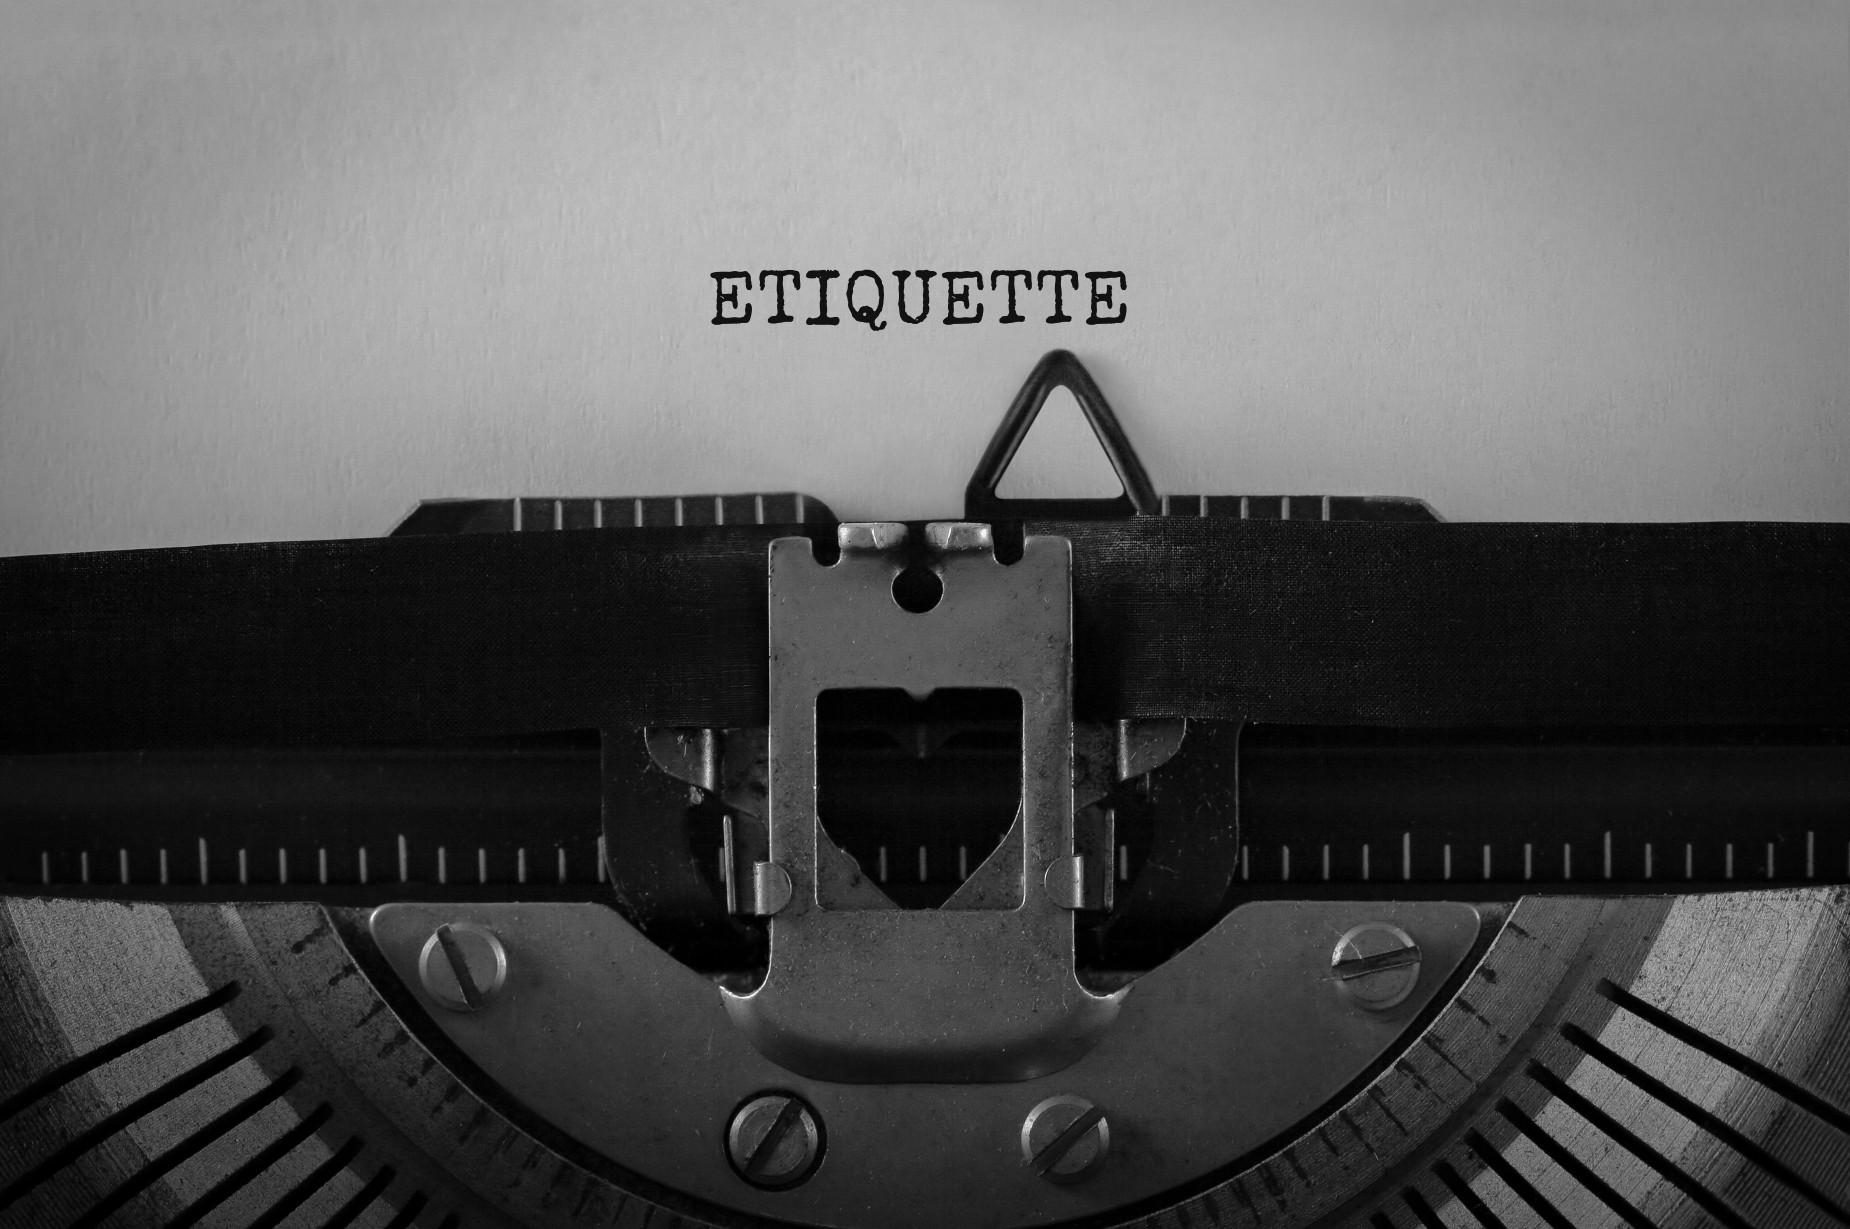 Dan Soschin - Email Etiquette